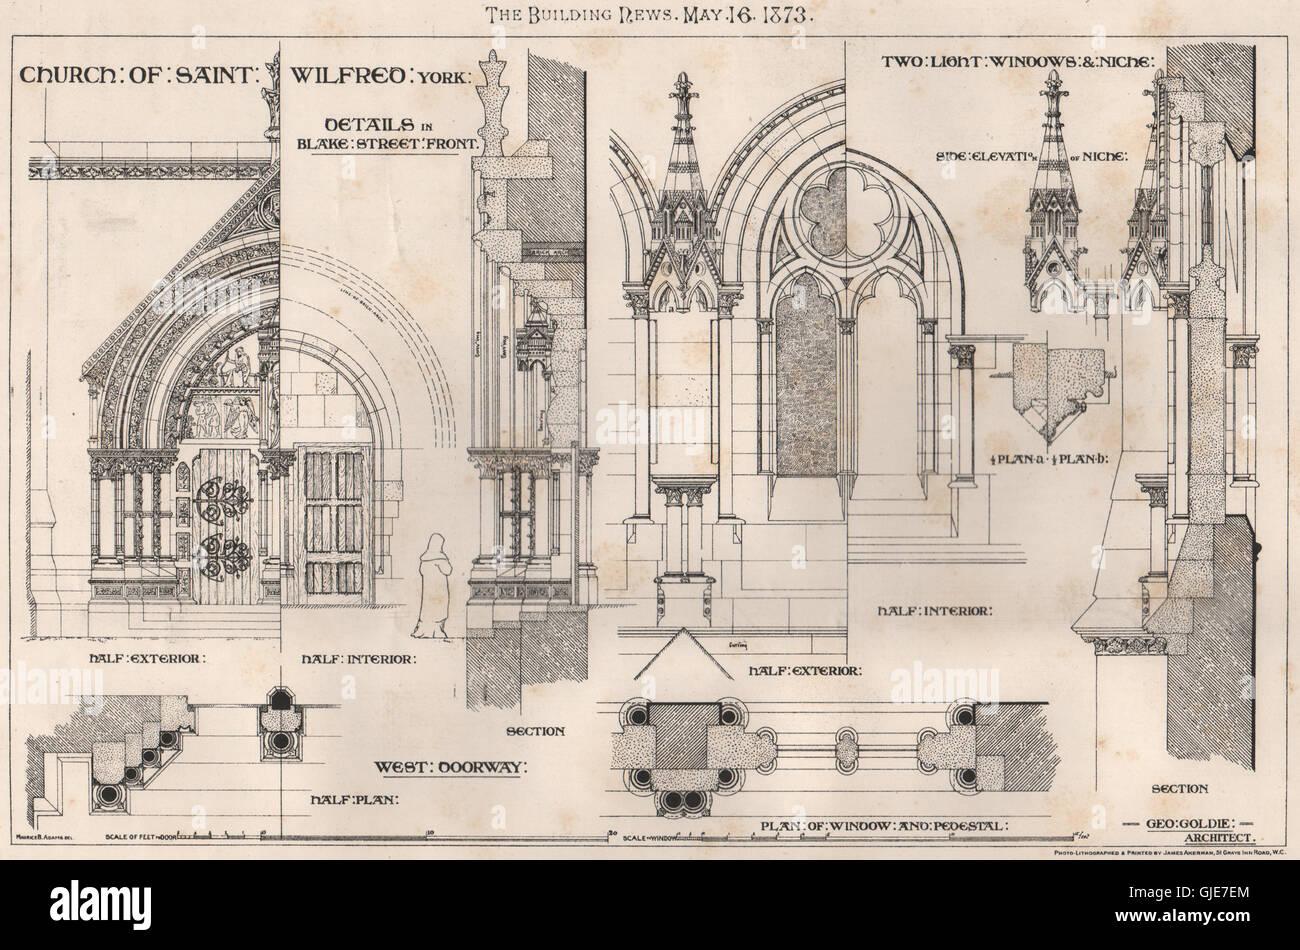 Church of Saint Wilfrid, York; Blake Street Front; Geo. Goldie, Architect, 1873 - Stock Image